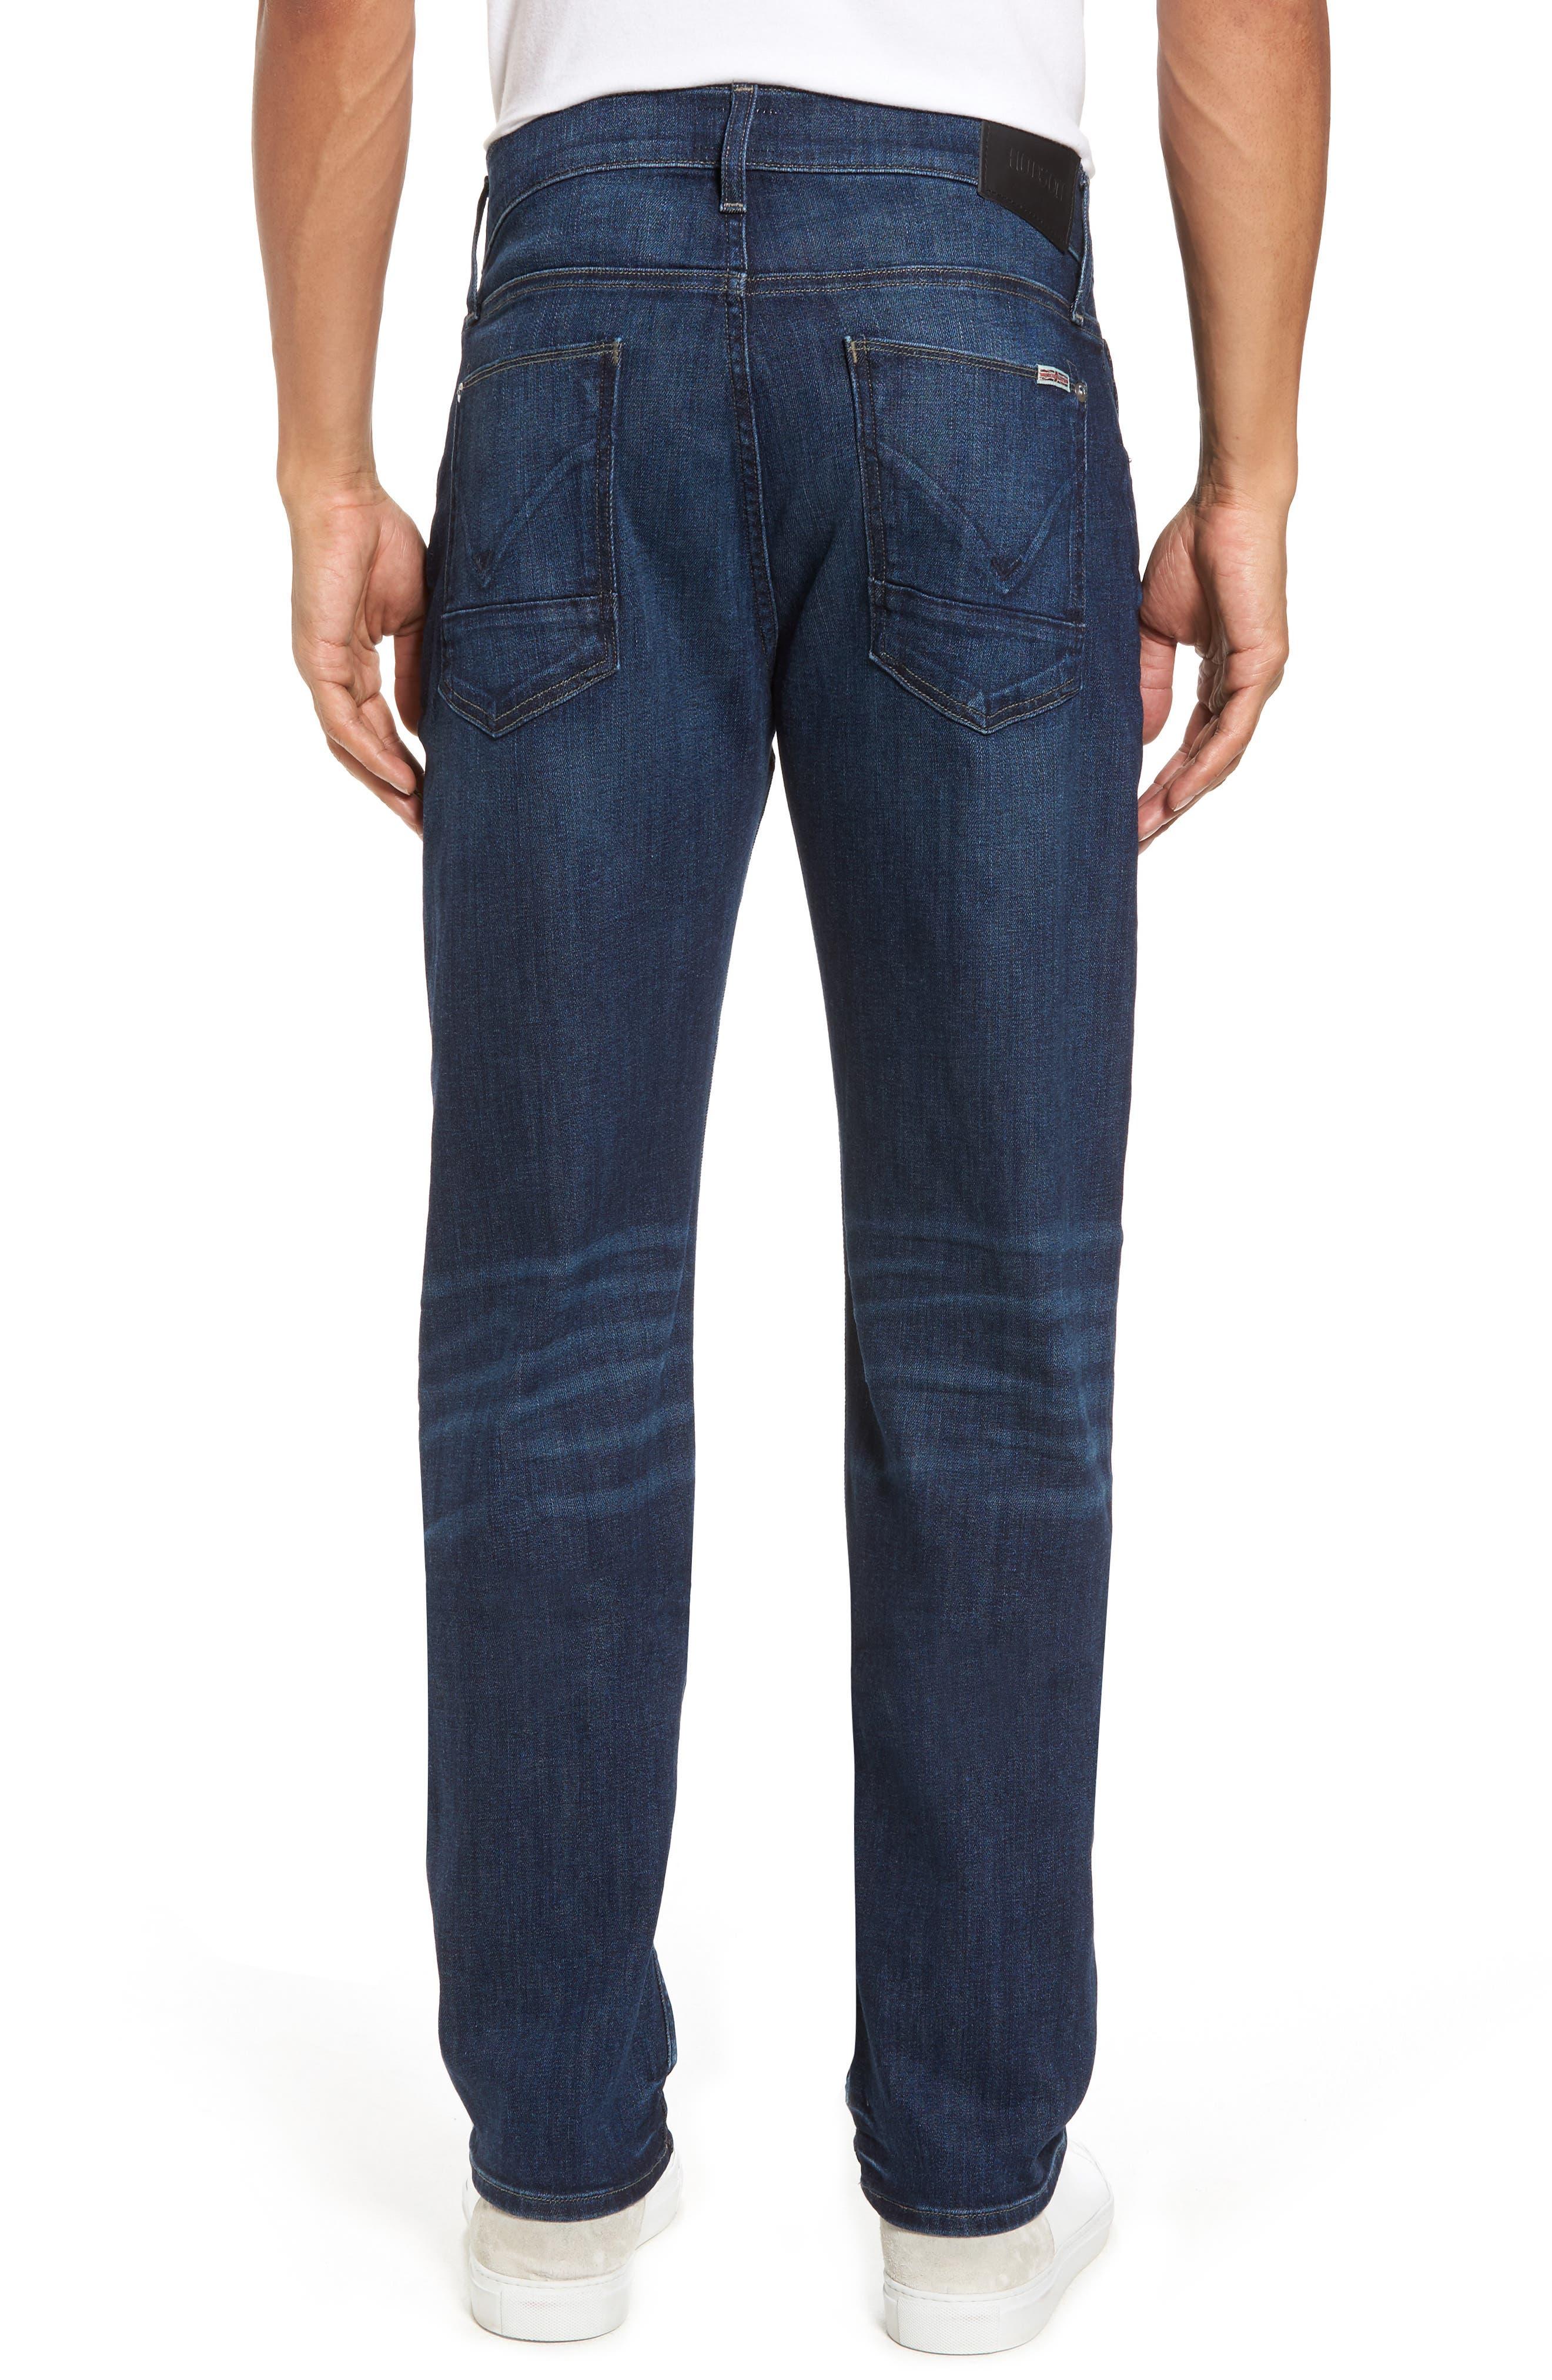 Byron Slim Straight Fit Jeans,                             Alternate thumbnail 2, color,                             Draper